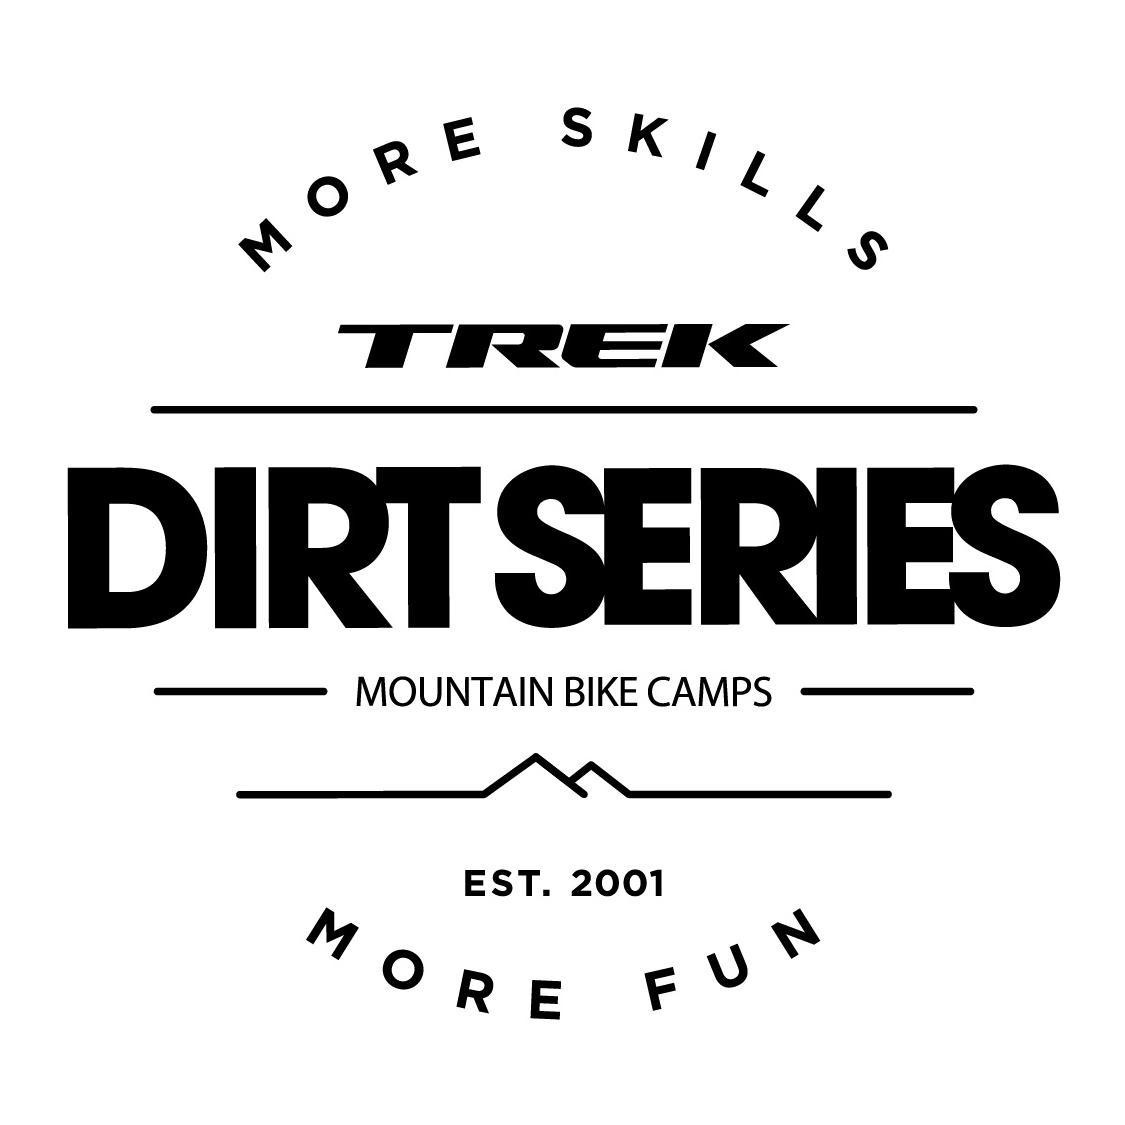 Dirt Series Mountain Bike Camp (co-ed) - Calgary, AB